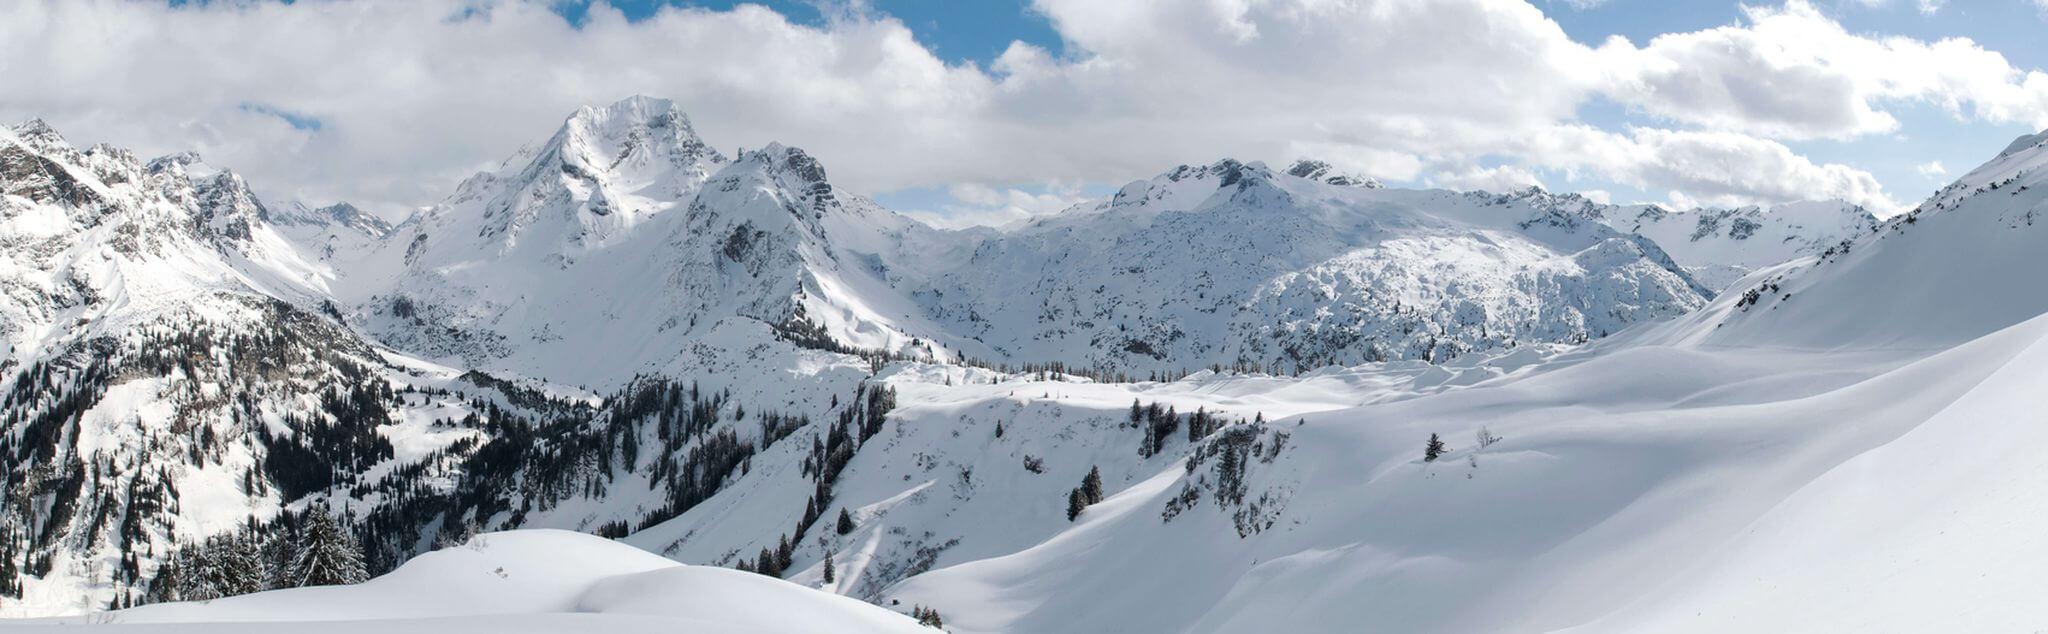 Sport da Neve a Sondrio